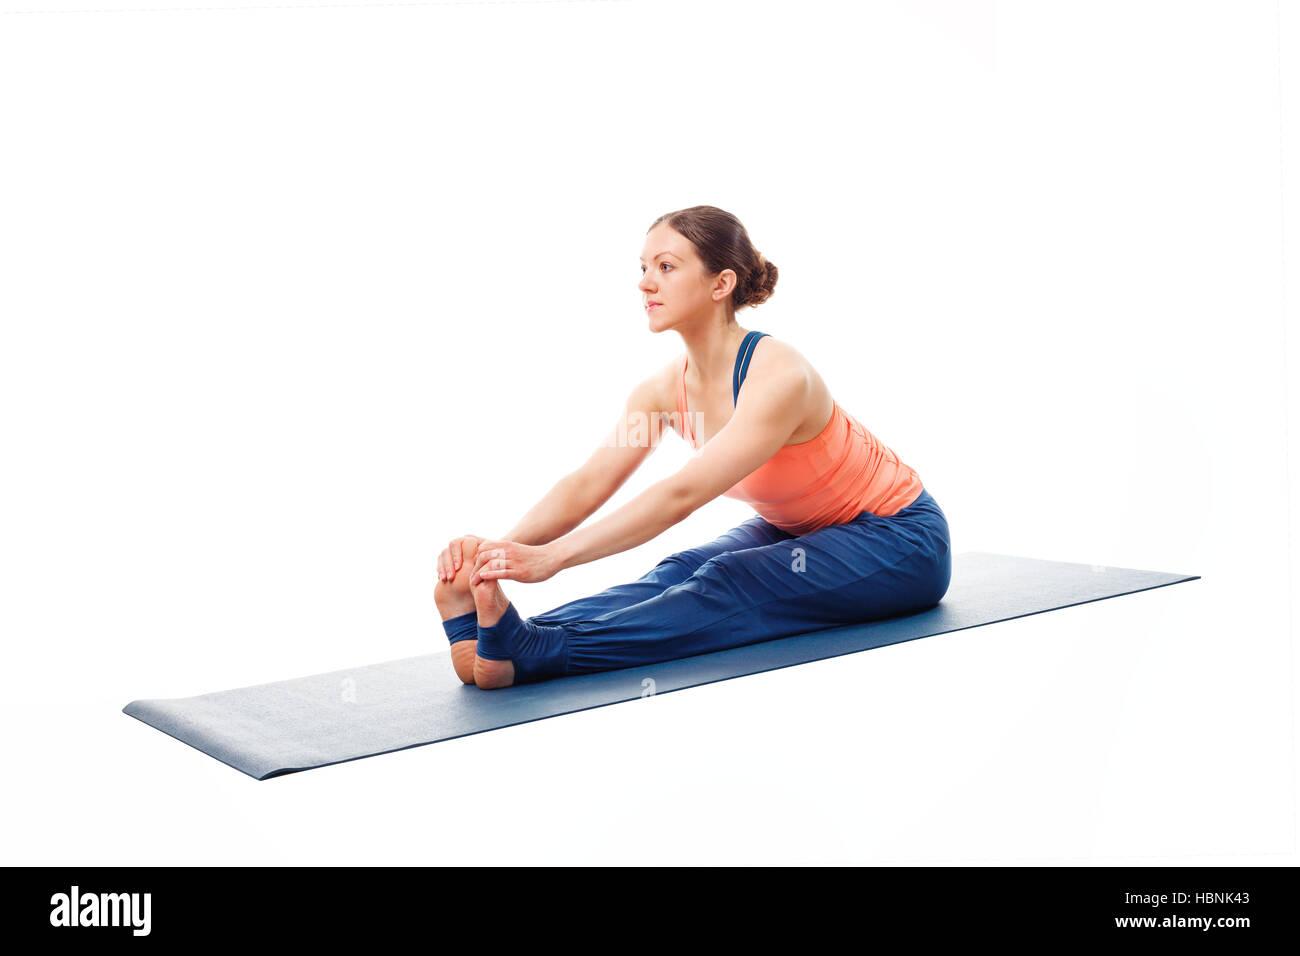 Woman doing Ashtanga Vinyasa Yoga asana Paschimottanasana - Stock Image